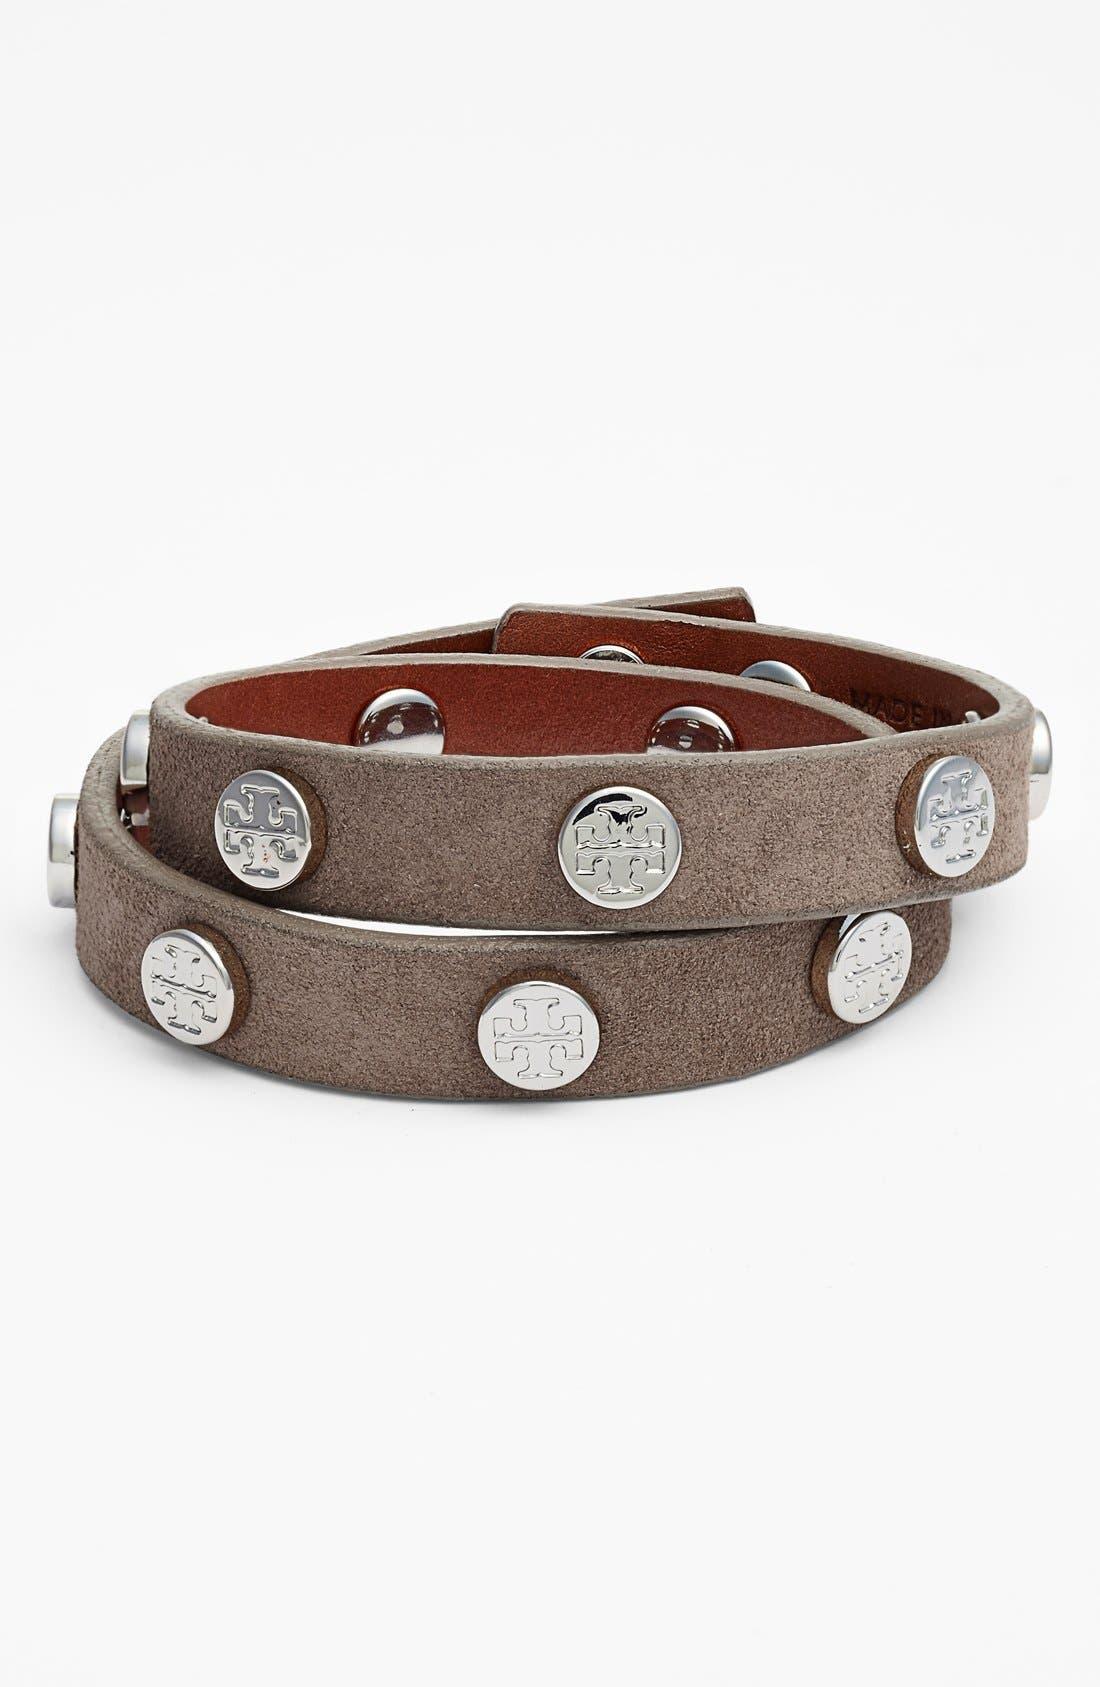 TORY BURCH Logo Leather Wrap Bracelet, Main, color, 200